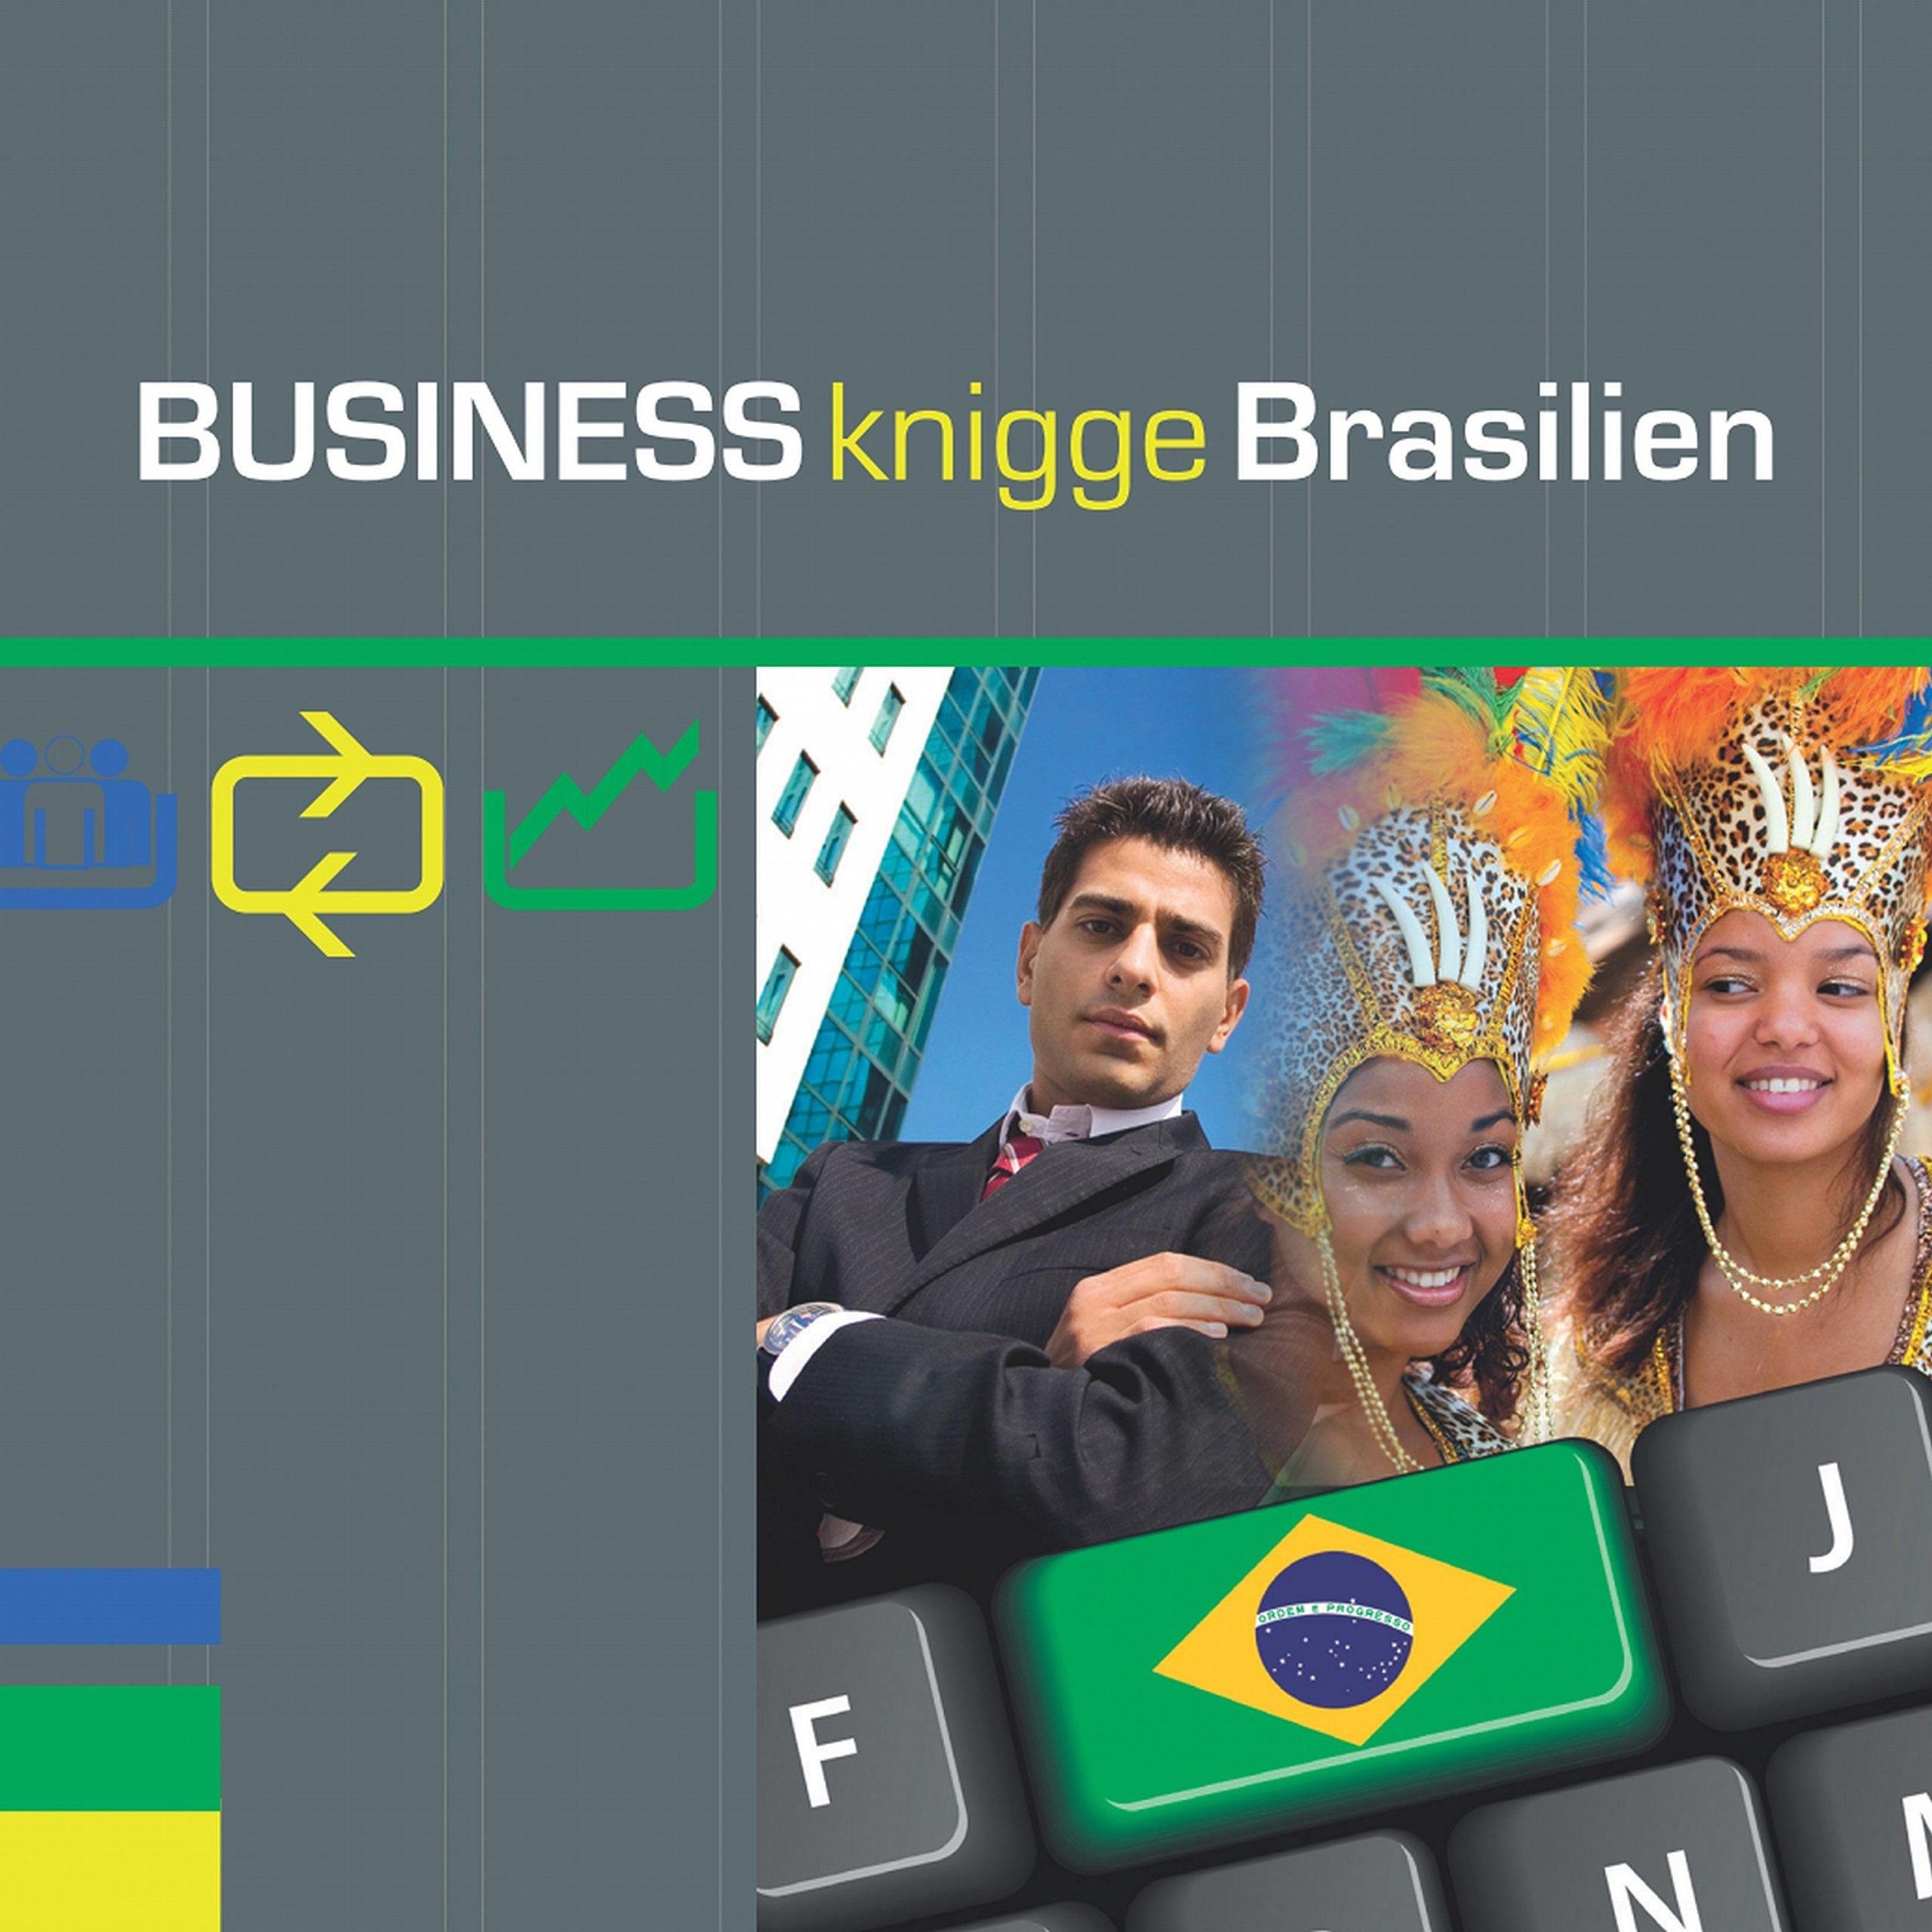 Business Knigge Brasilien